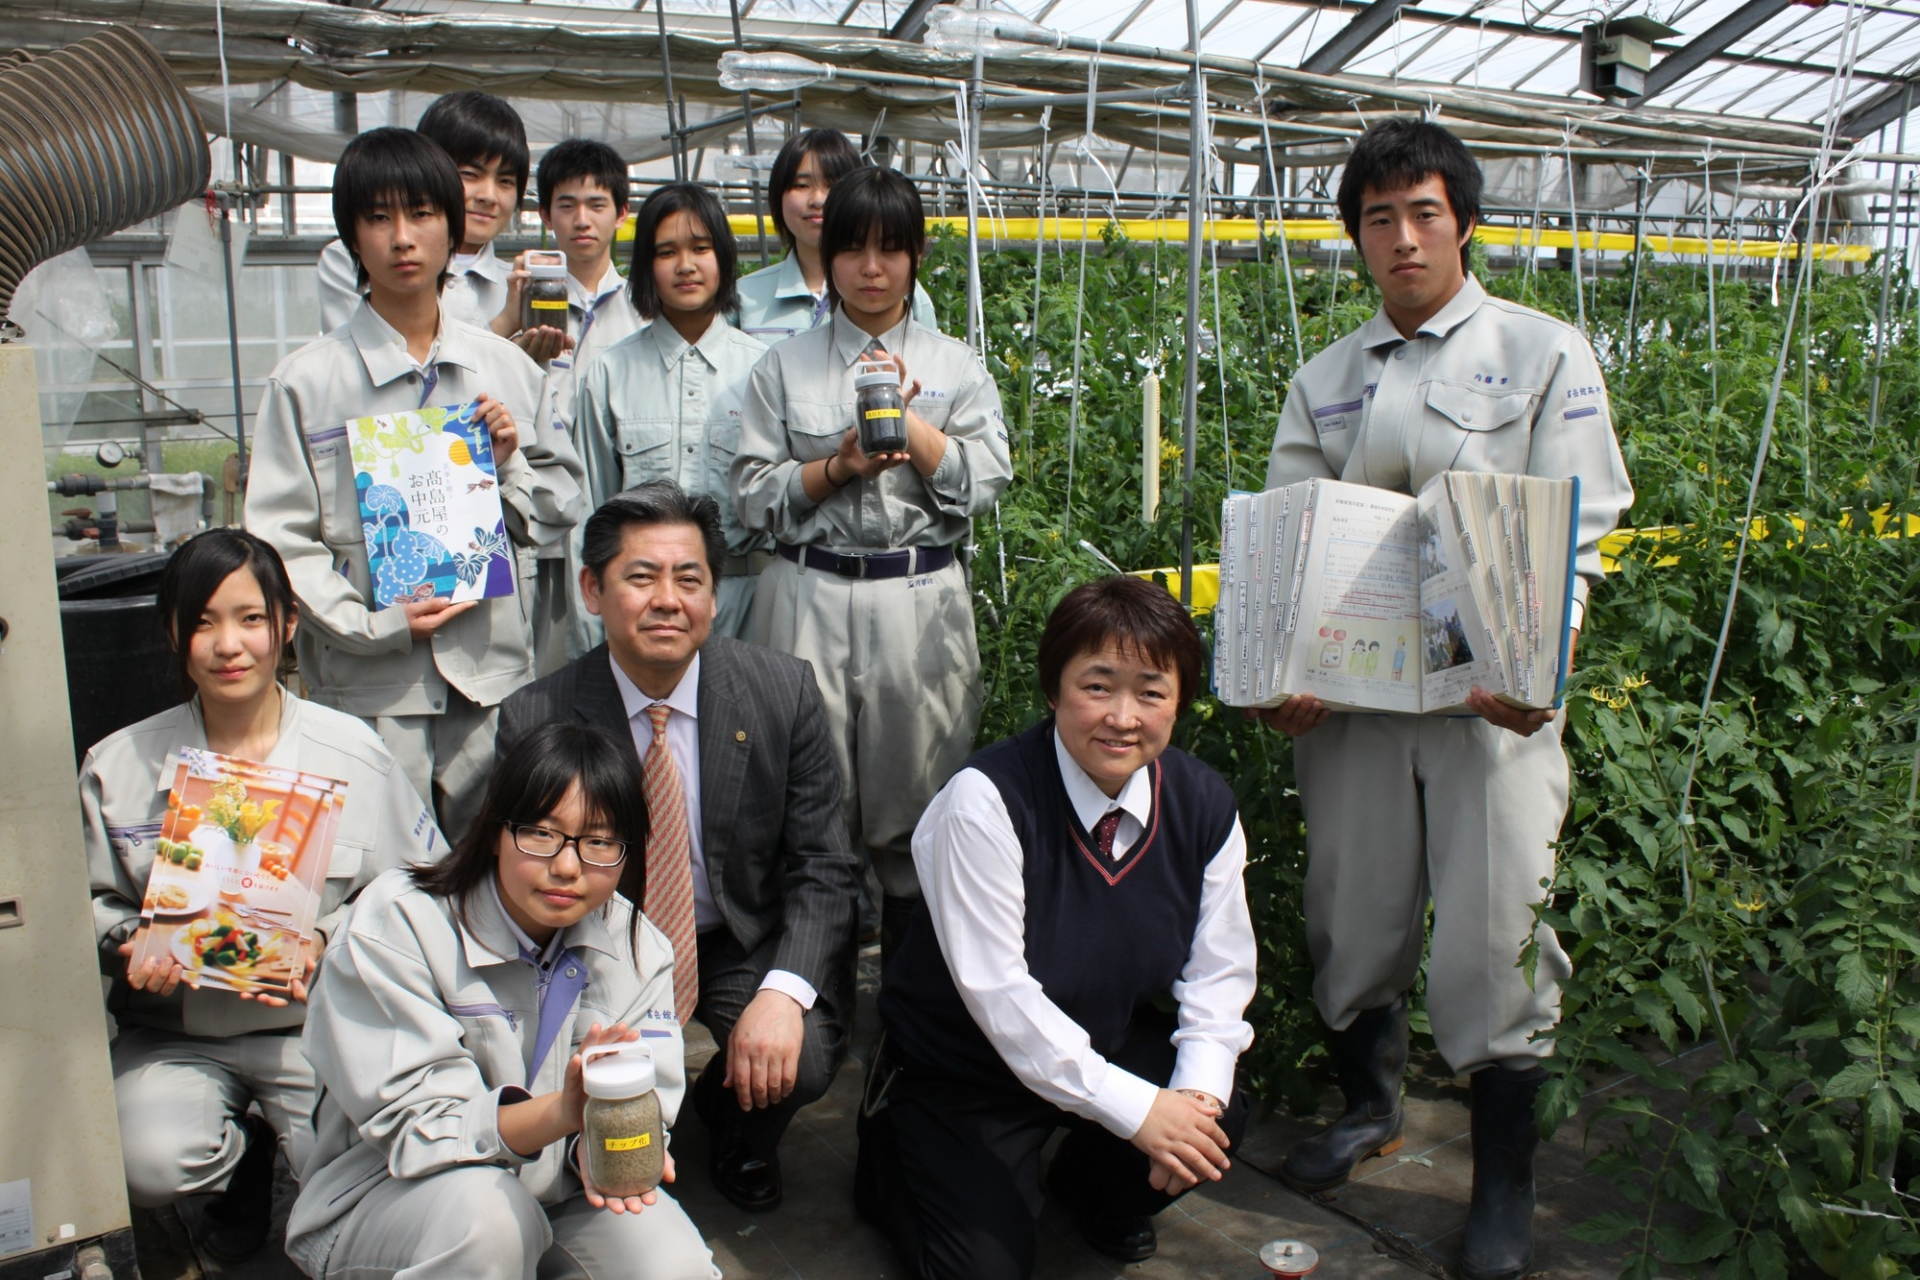 Vietnamese laborers in Japan (Photo: Bao Nguoi Lao Dong)